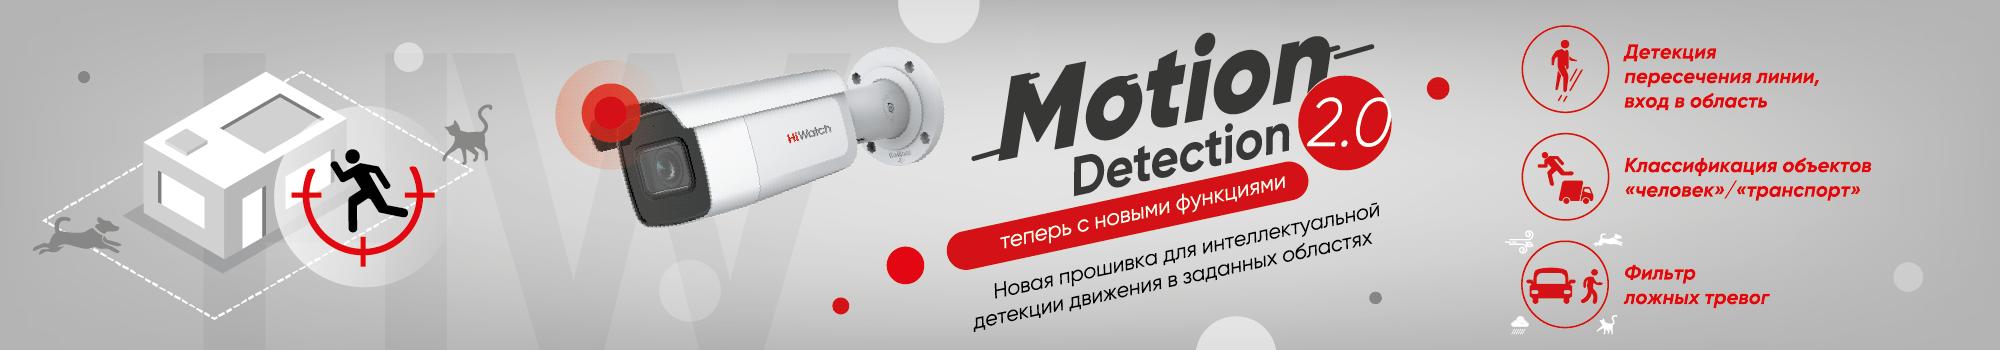 motion-detection-2_2000x350_2